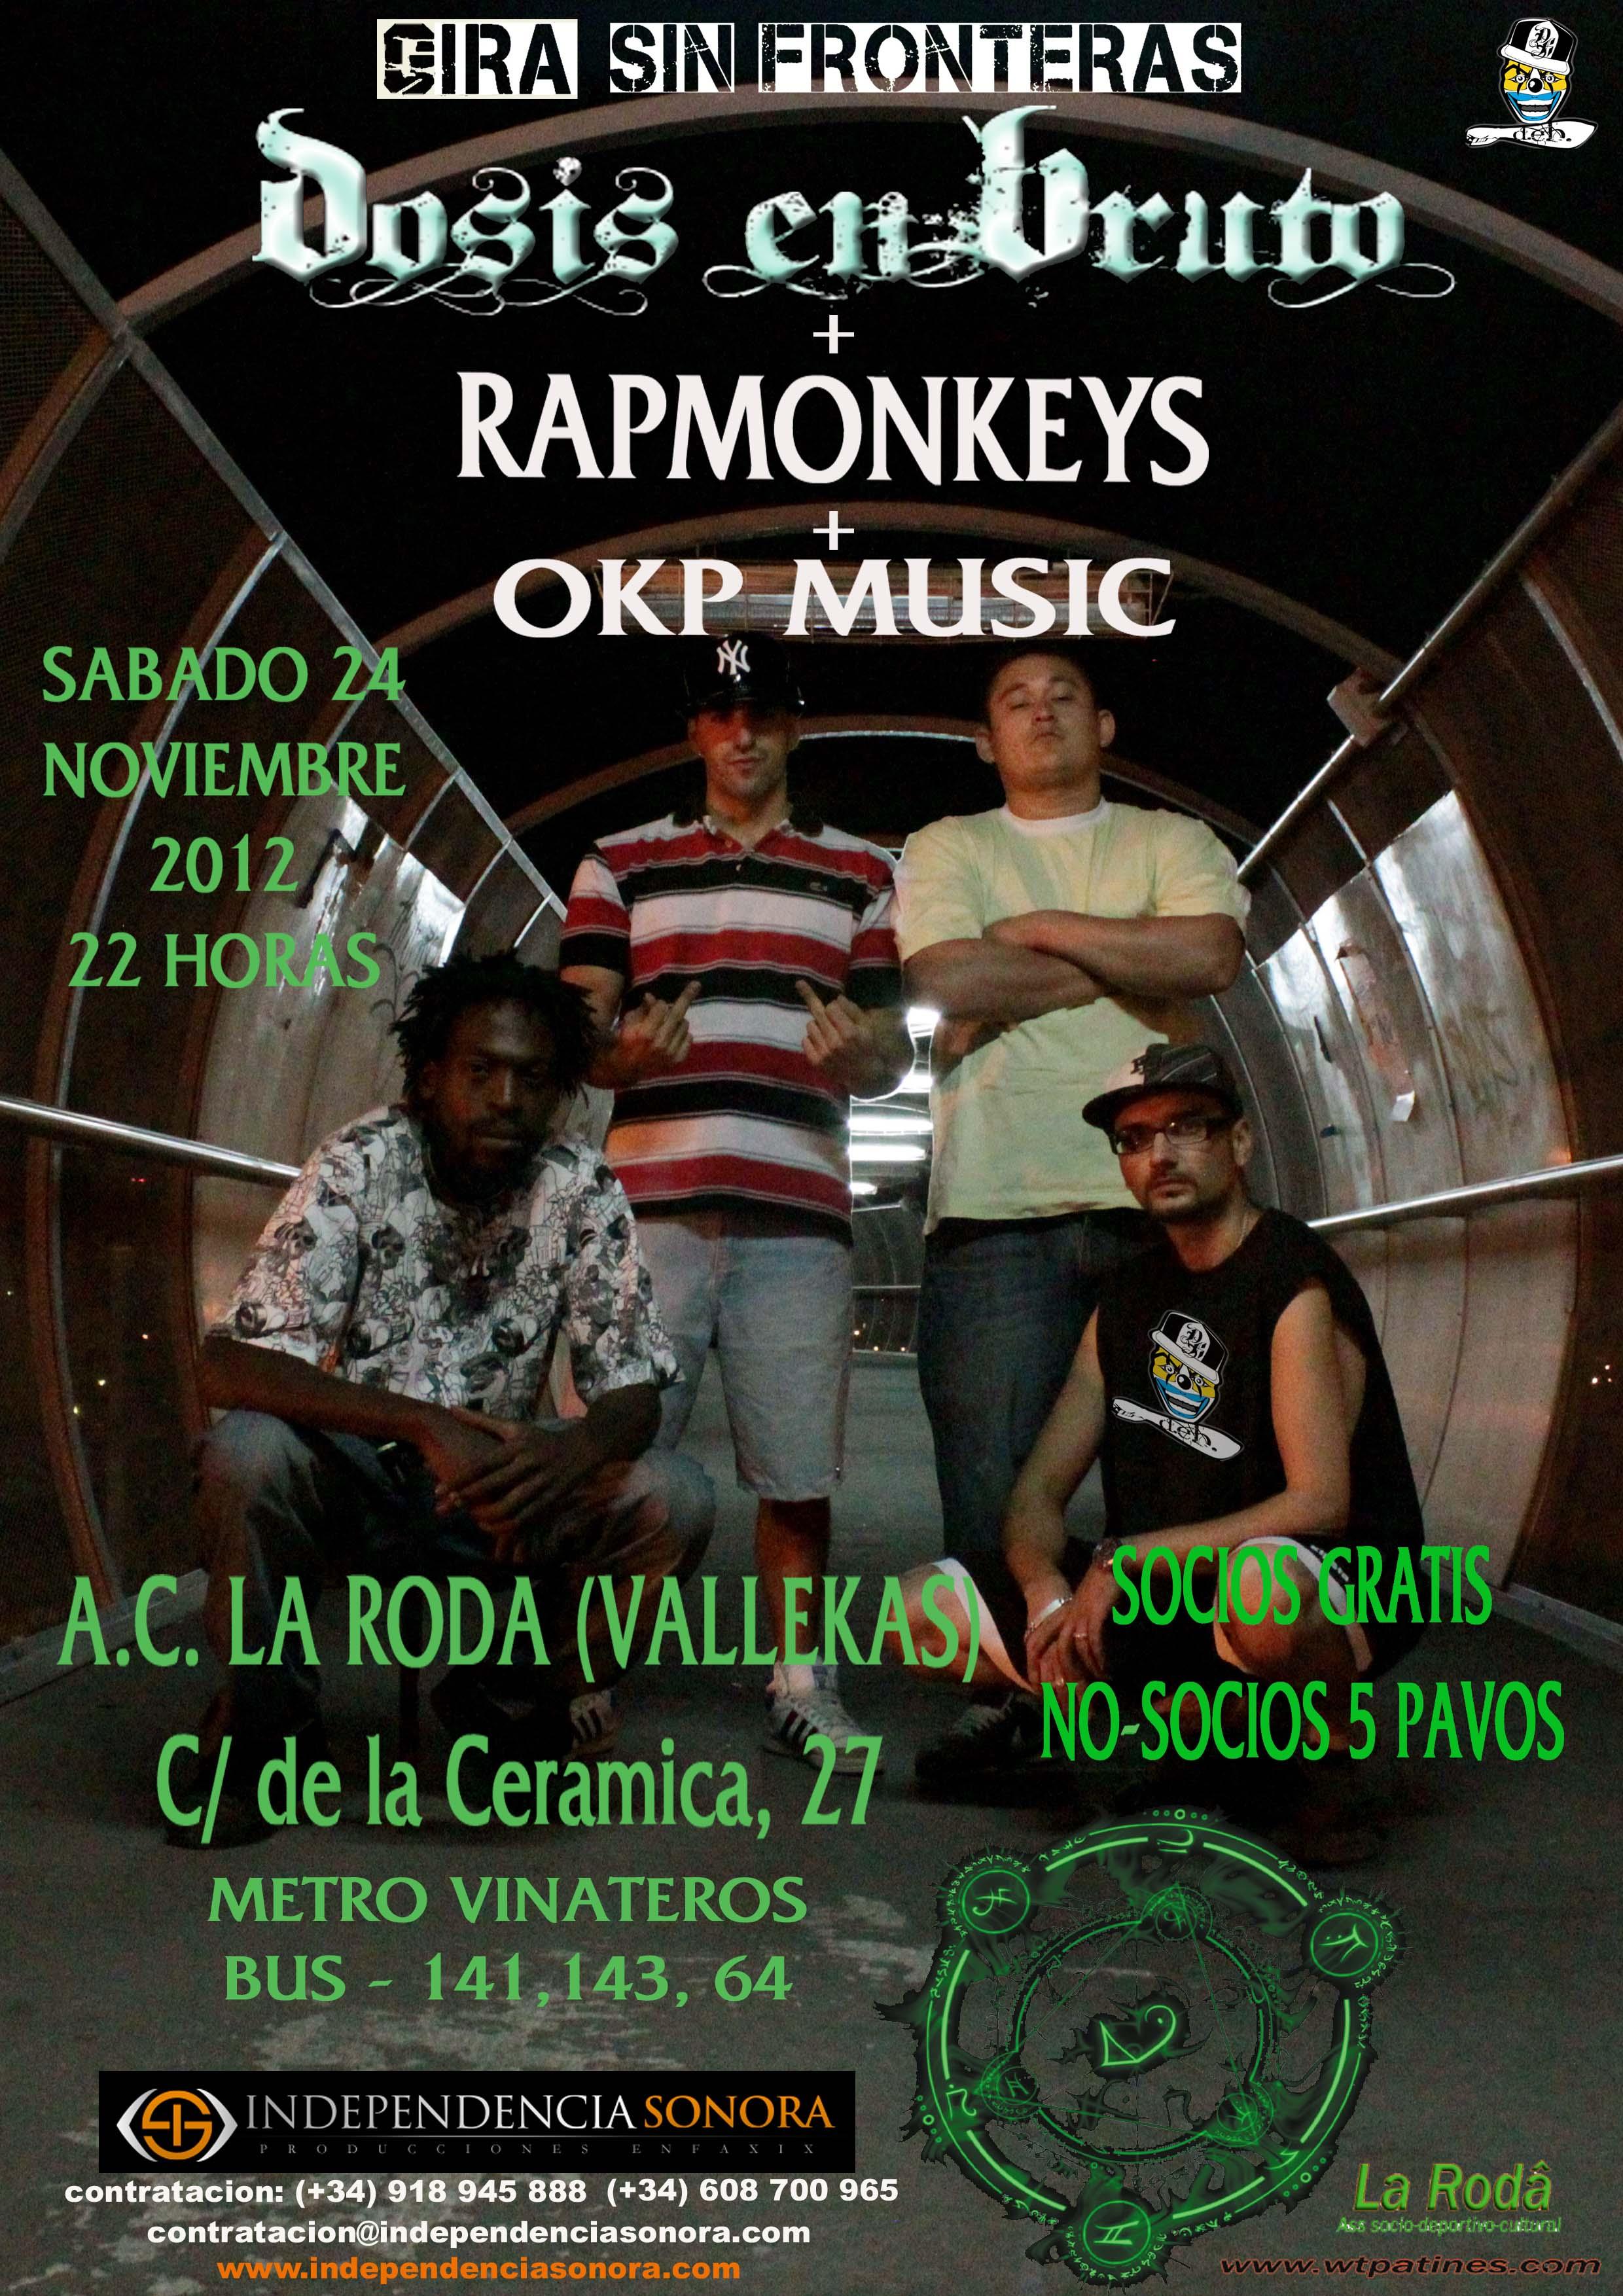 DOSIS EN BRUTO + RAPMONKEYS + OKPMUSIC